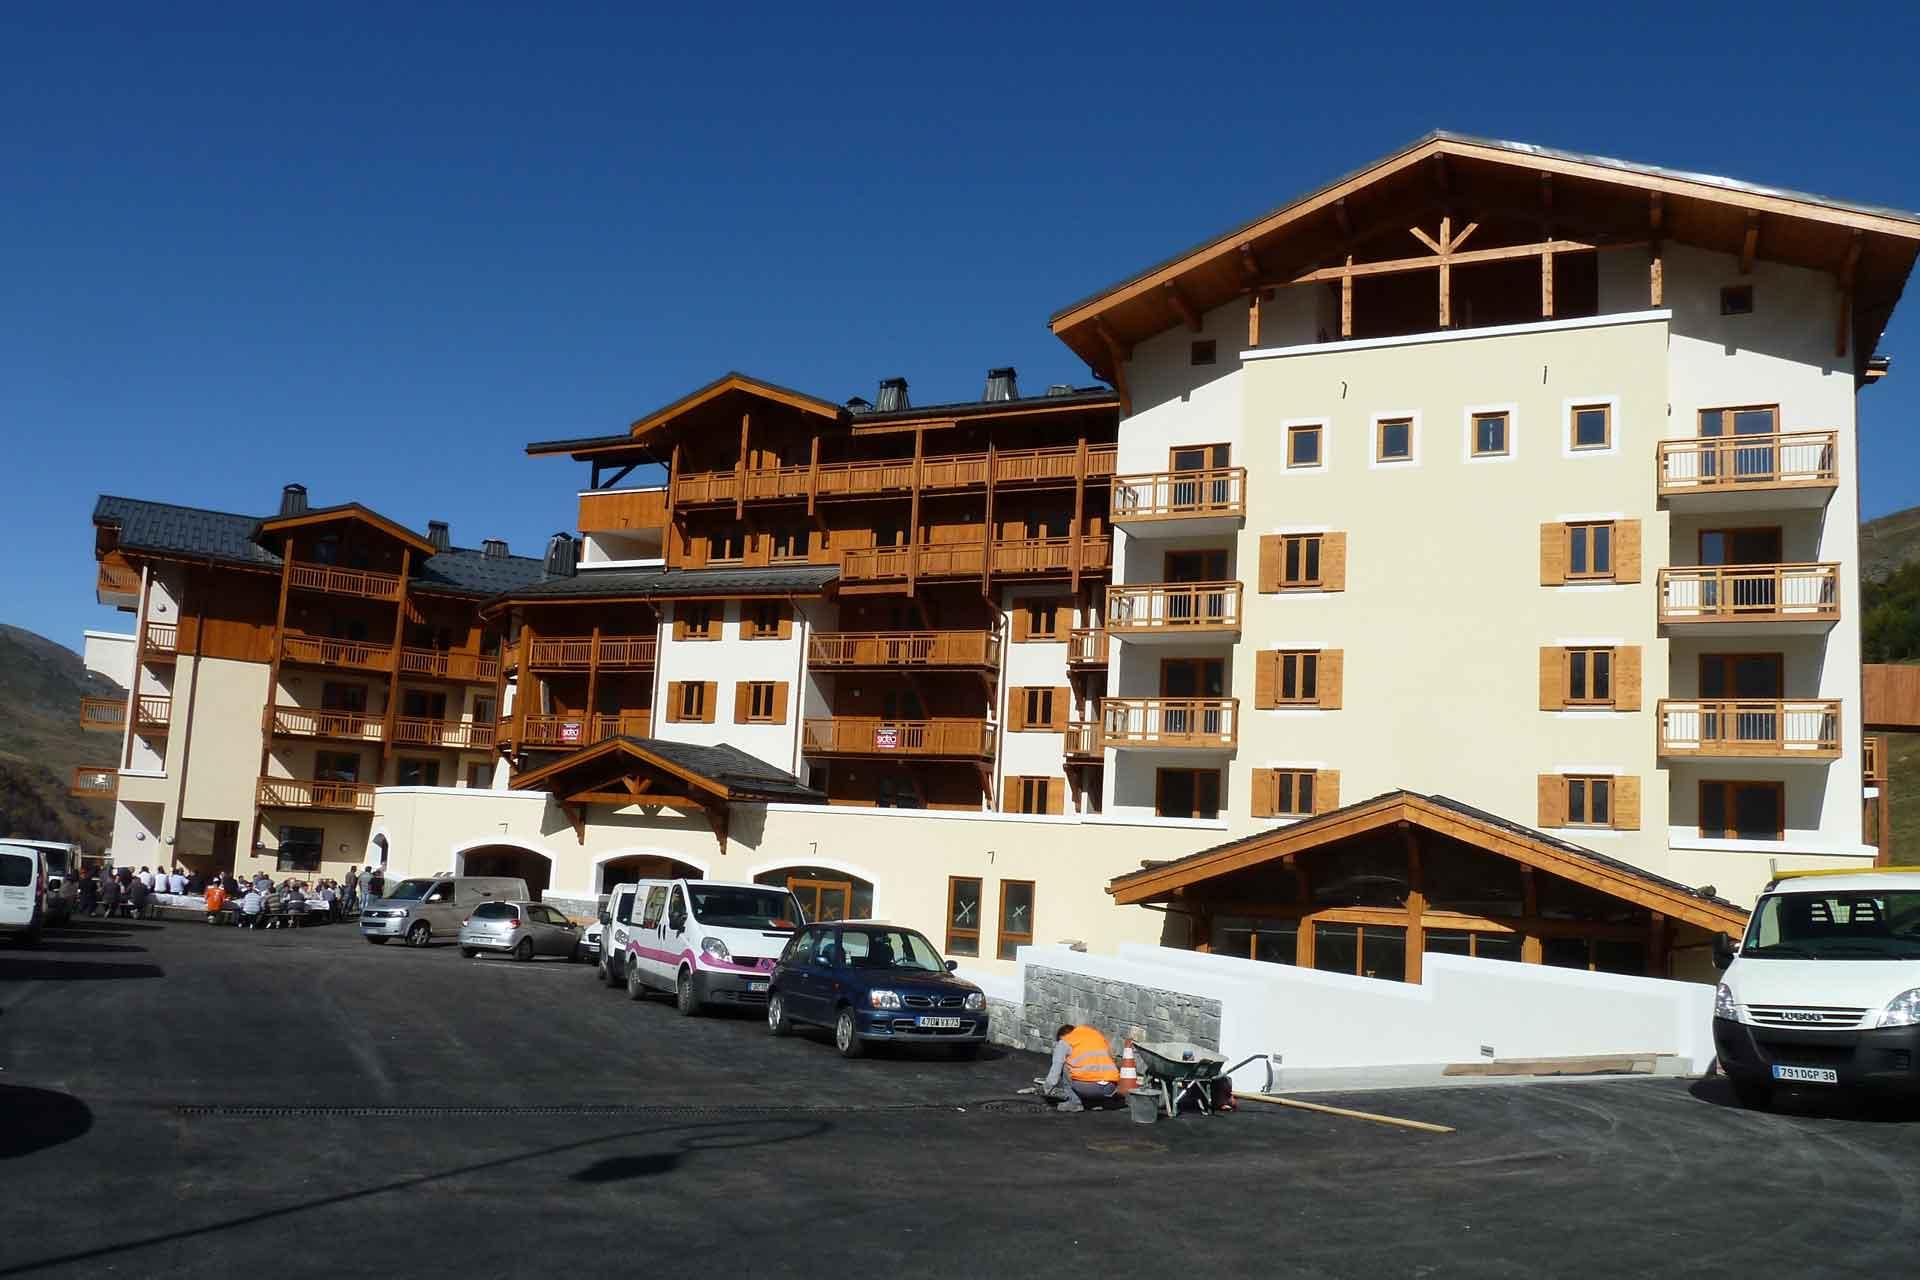 140-hotel-chaletmontvallon-img-(2)